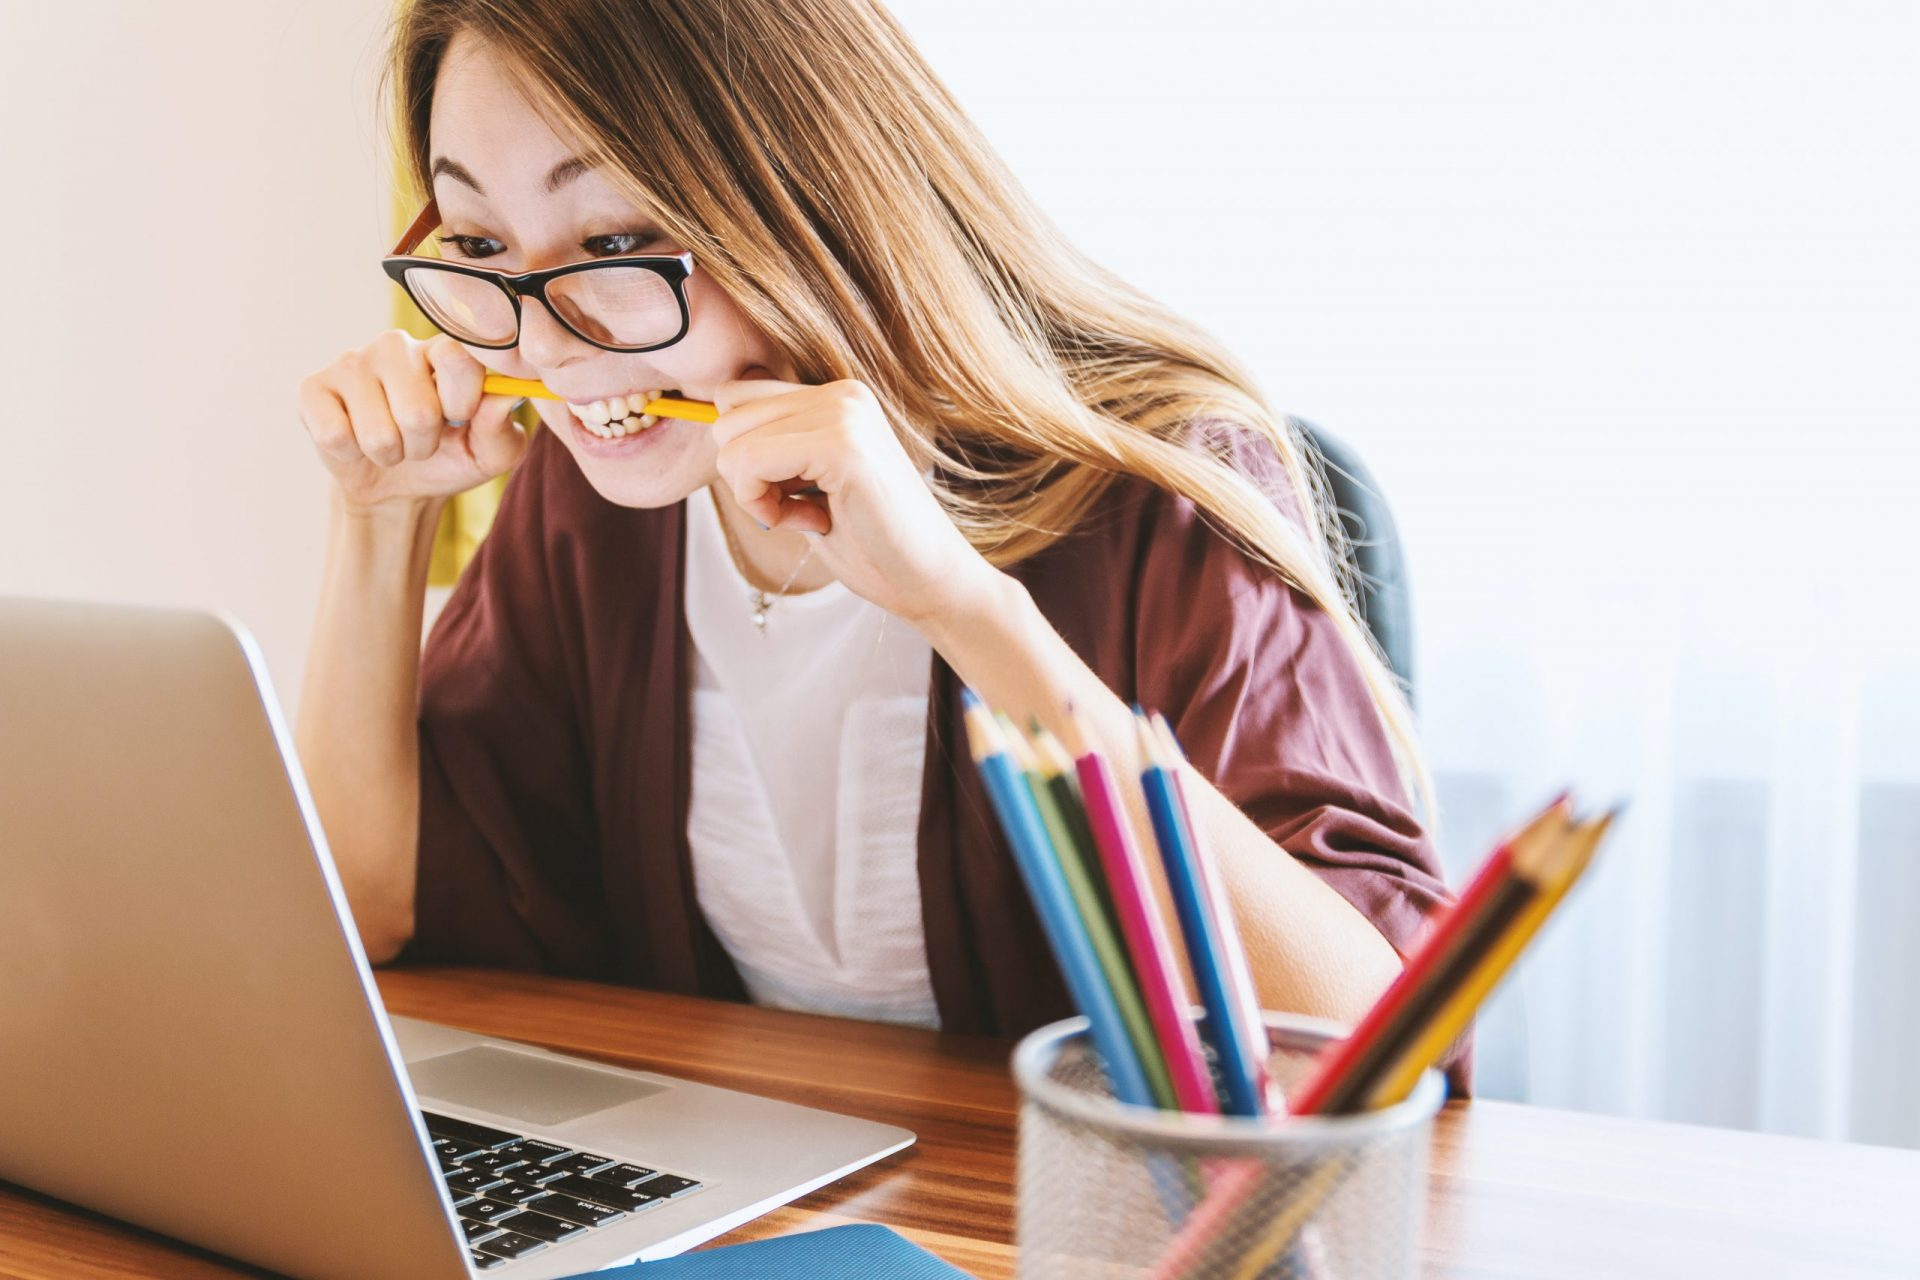 Frau kaut Bleistift vor Laptop